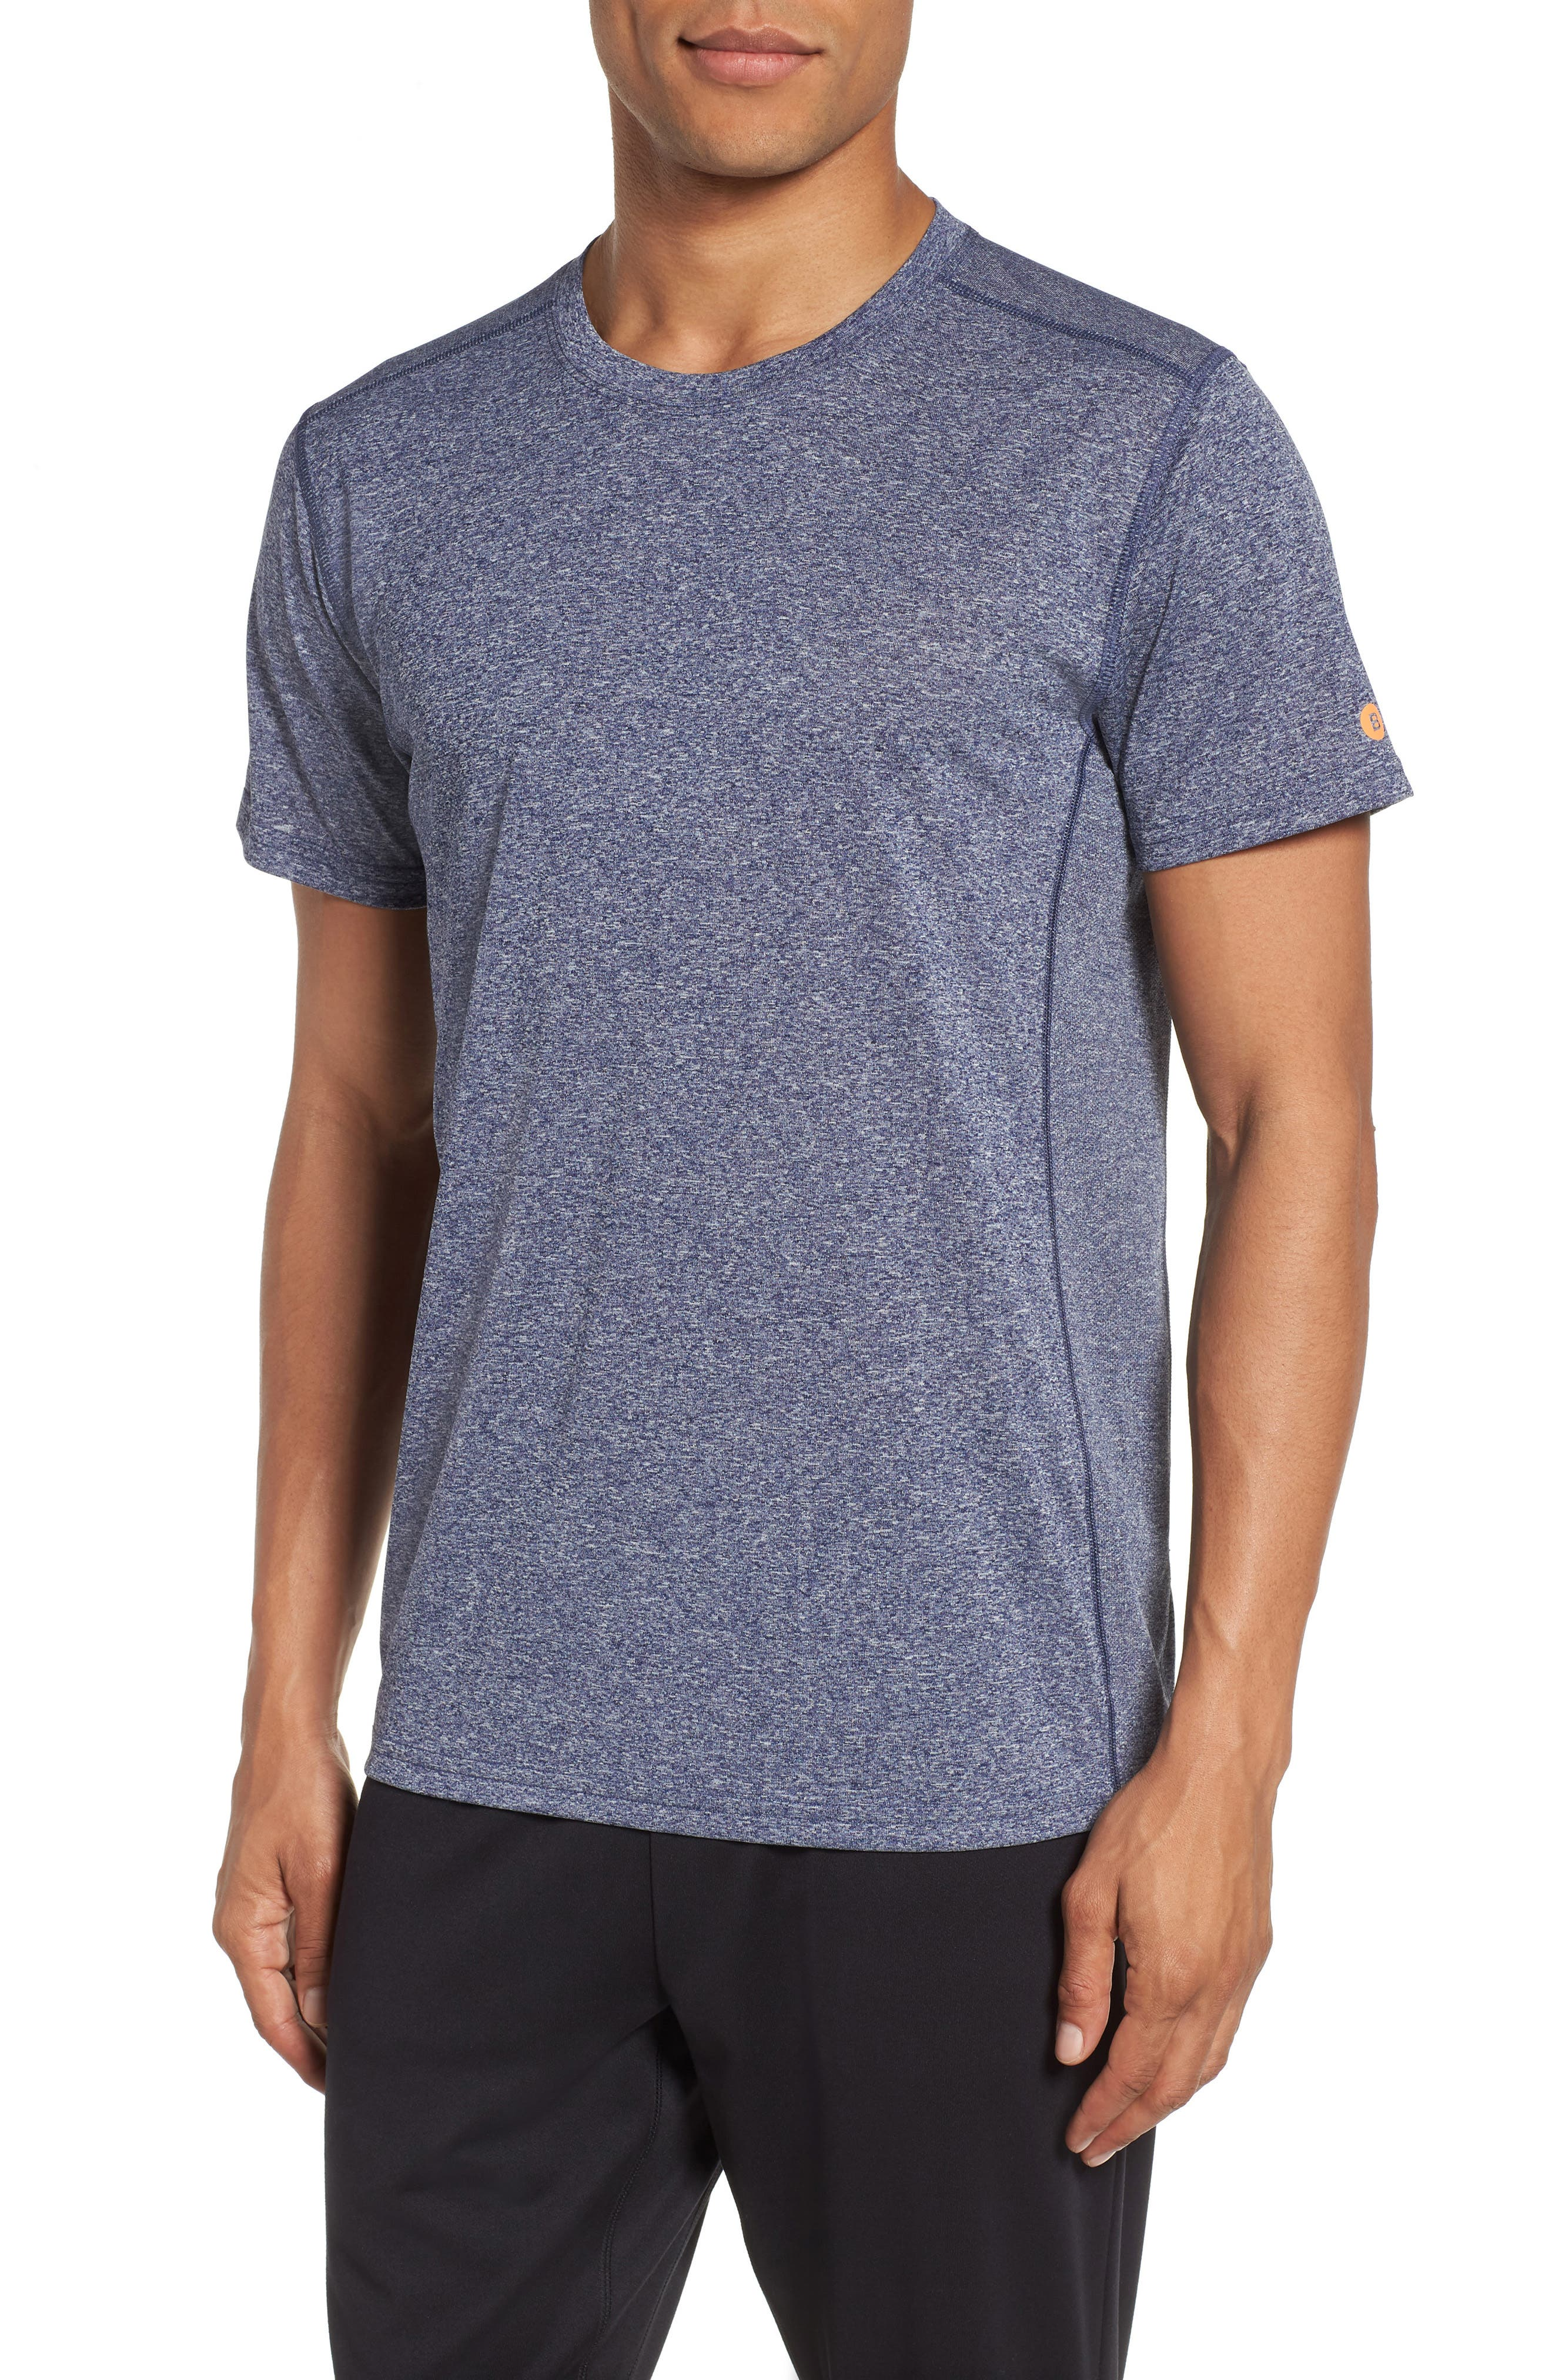 Goodsport Mesh Panel T-Shirt,                             Main thumbnail 5, color,